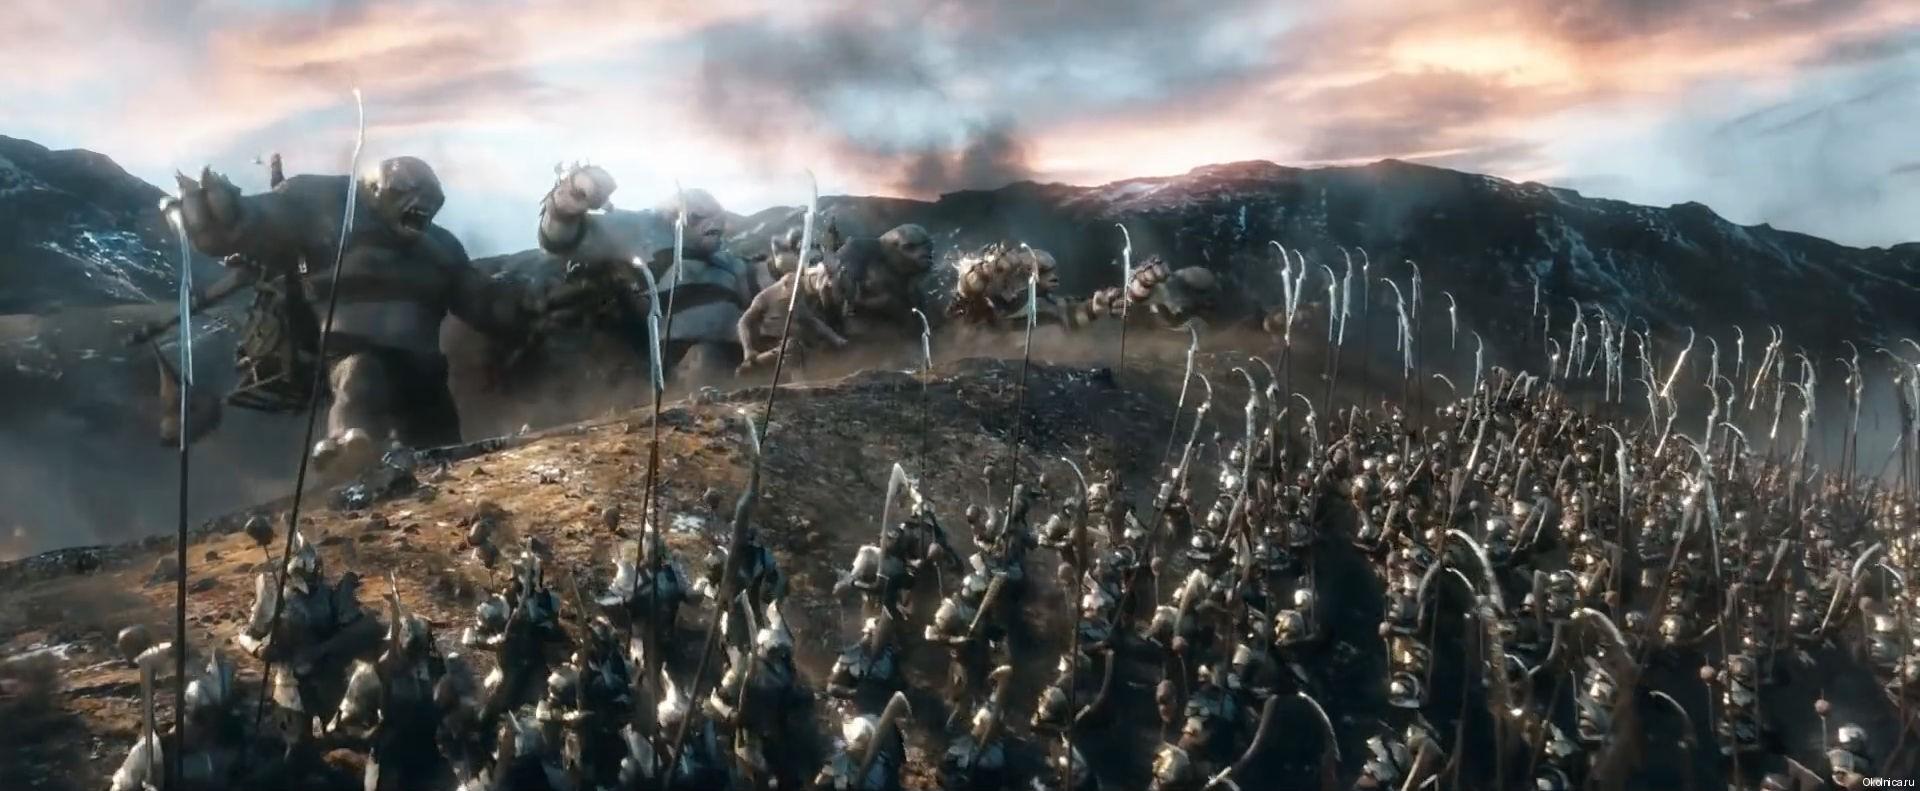 Kino_Hobbit_Bitva_pyati_voinstv_47